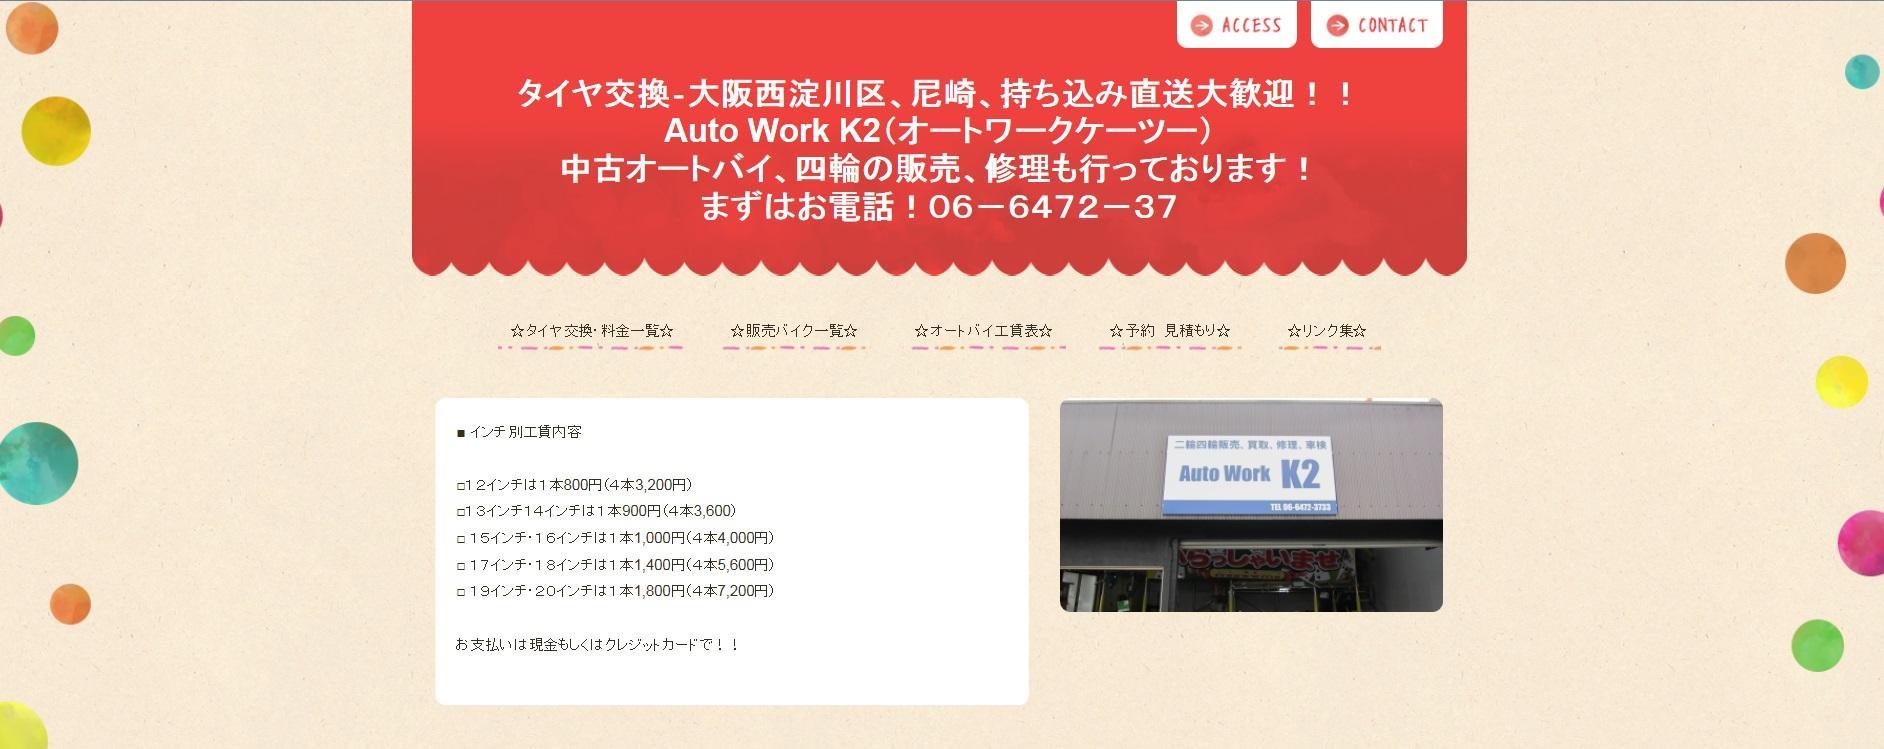 Auto Work K2